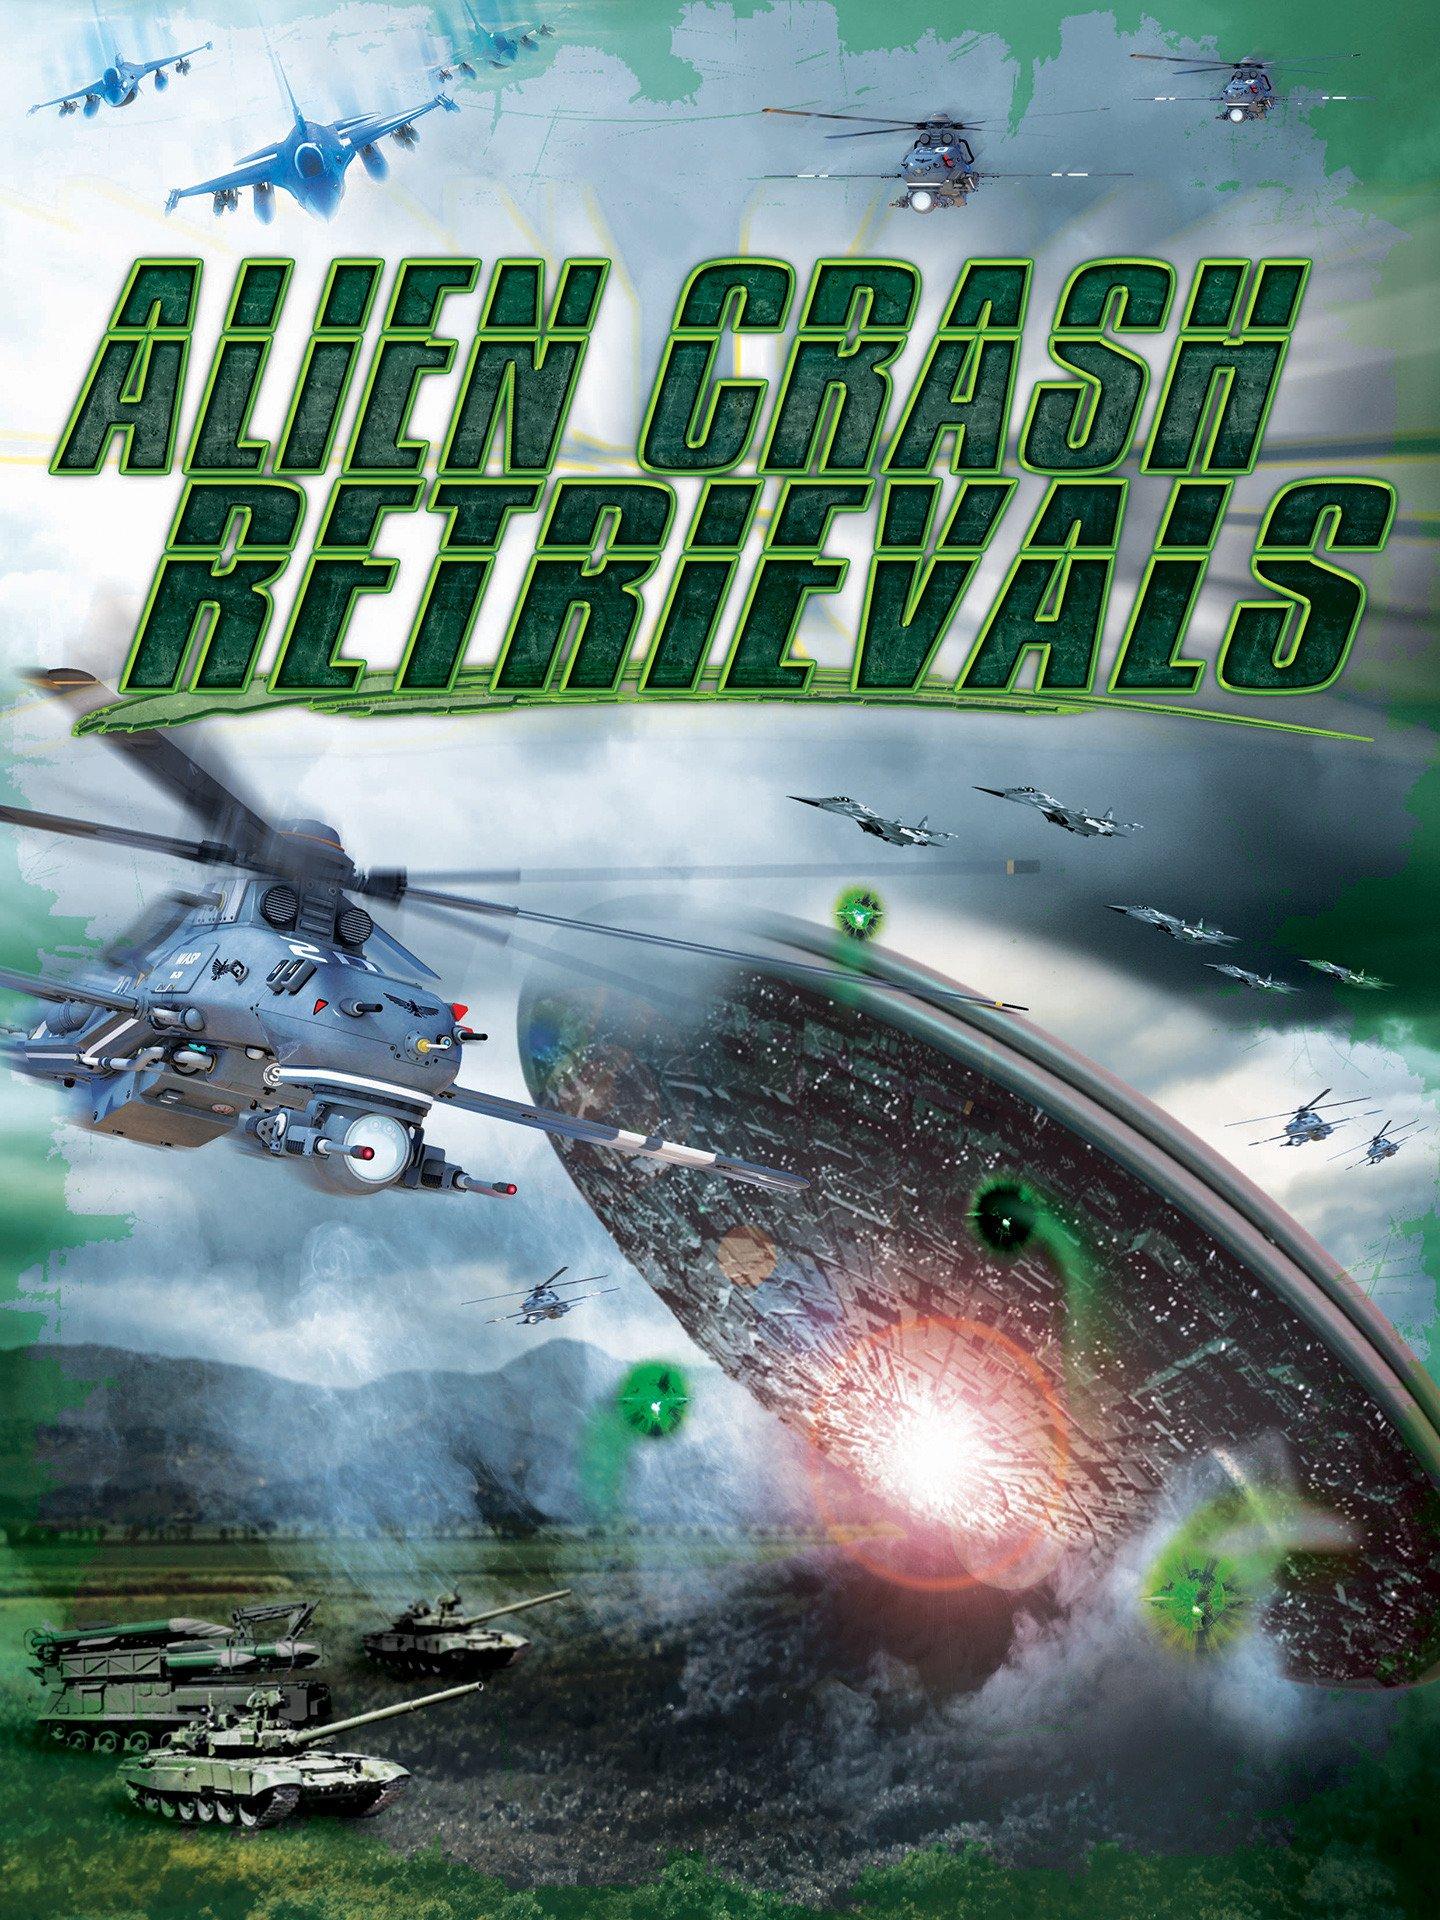 Alien Crash Retrievals on Amazon Prime Video UK